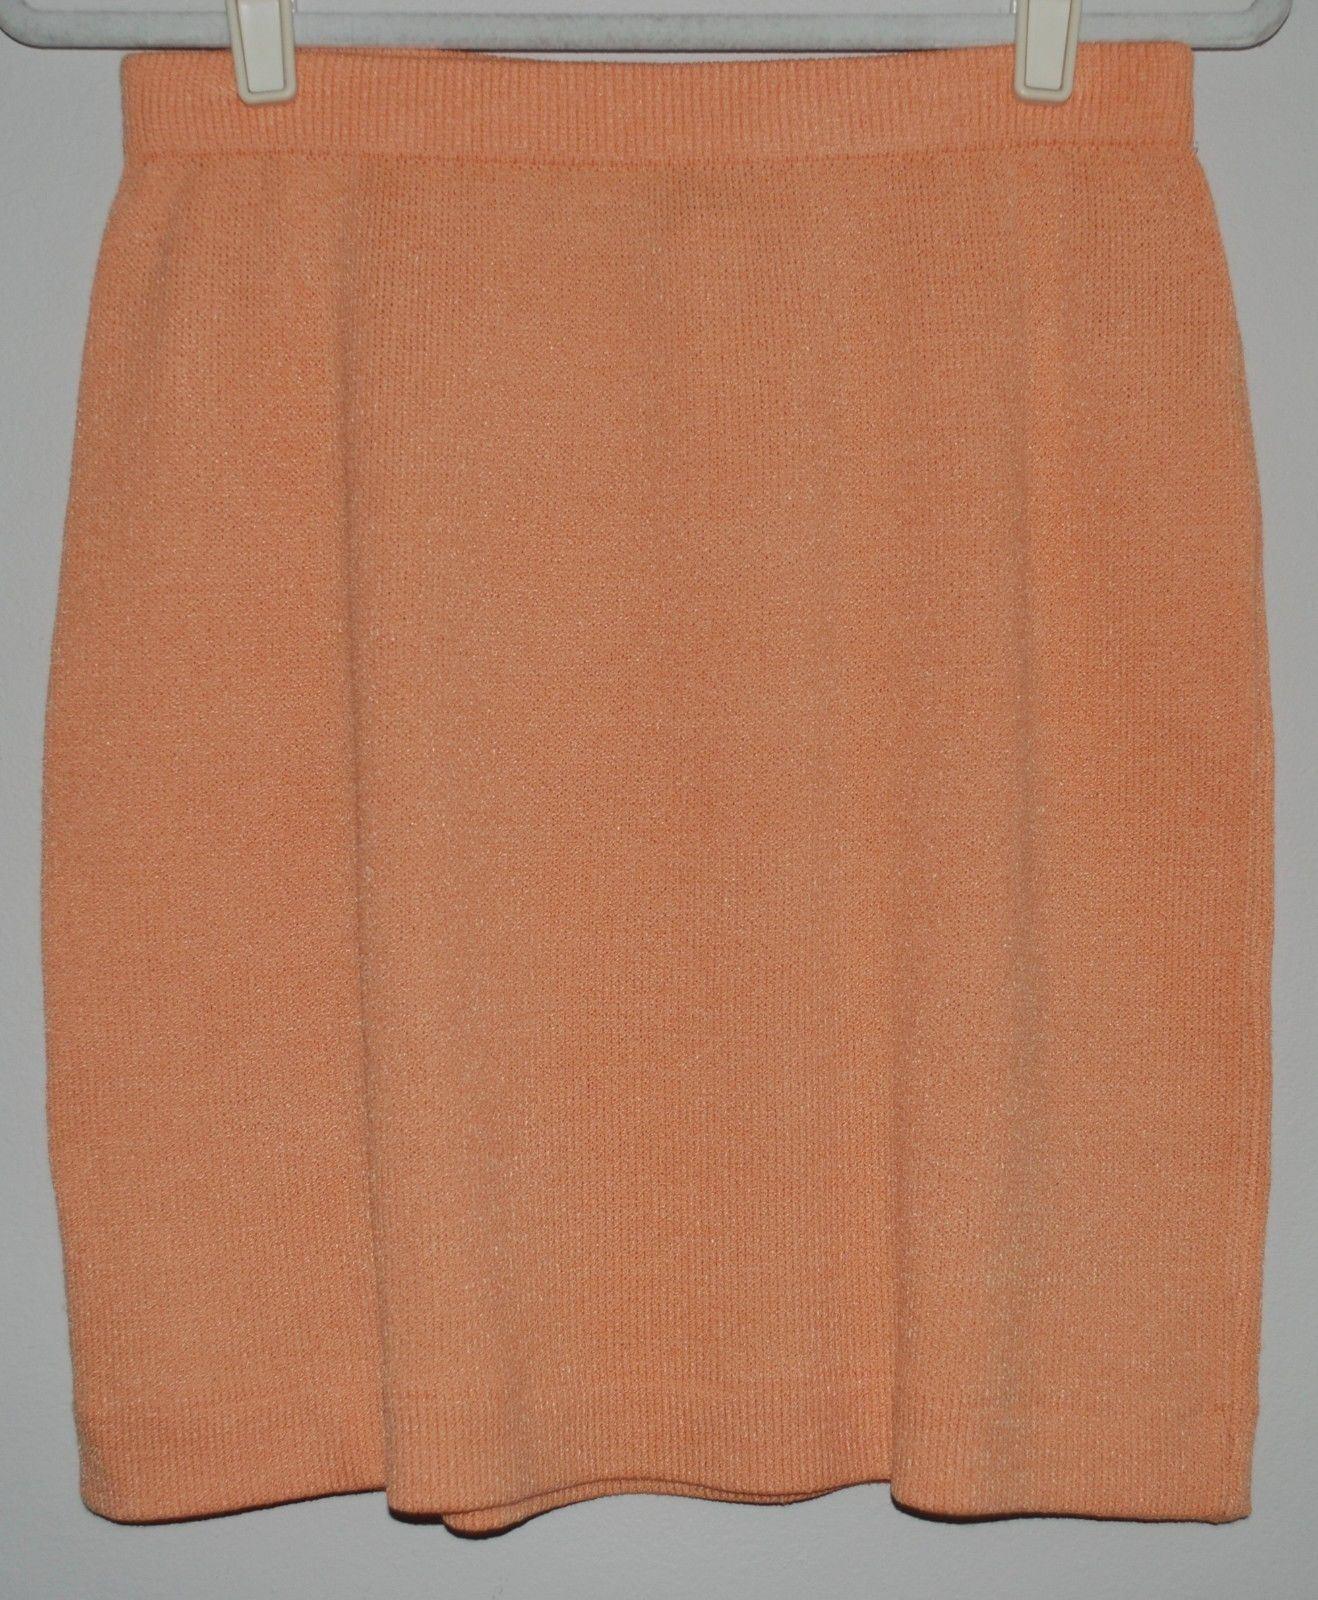 ST. JOHN COLLECTION - Santana Knit Skirt Size 8 - Sherbet orange - Pull On Style